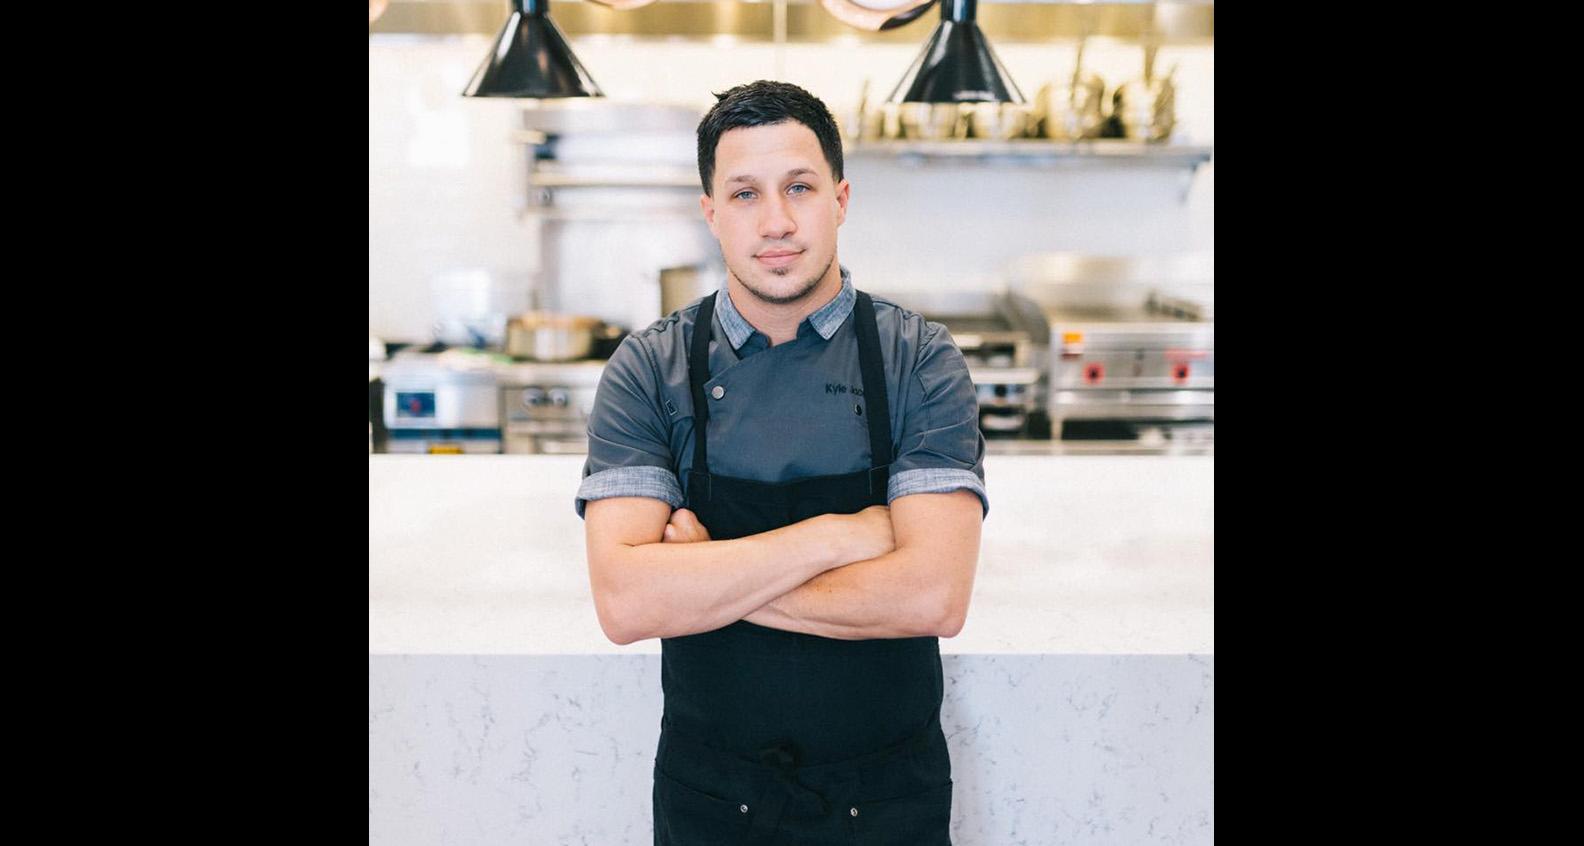 Chef Kyle Jacovino